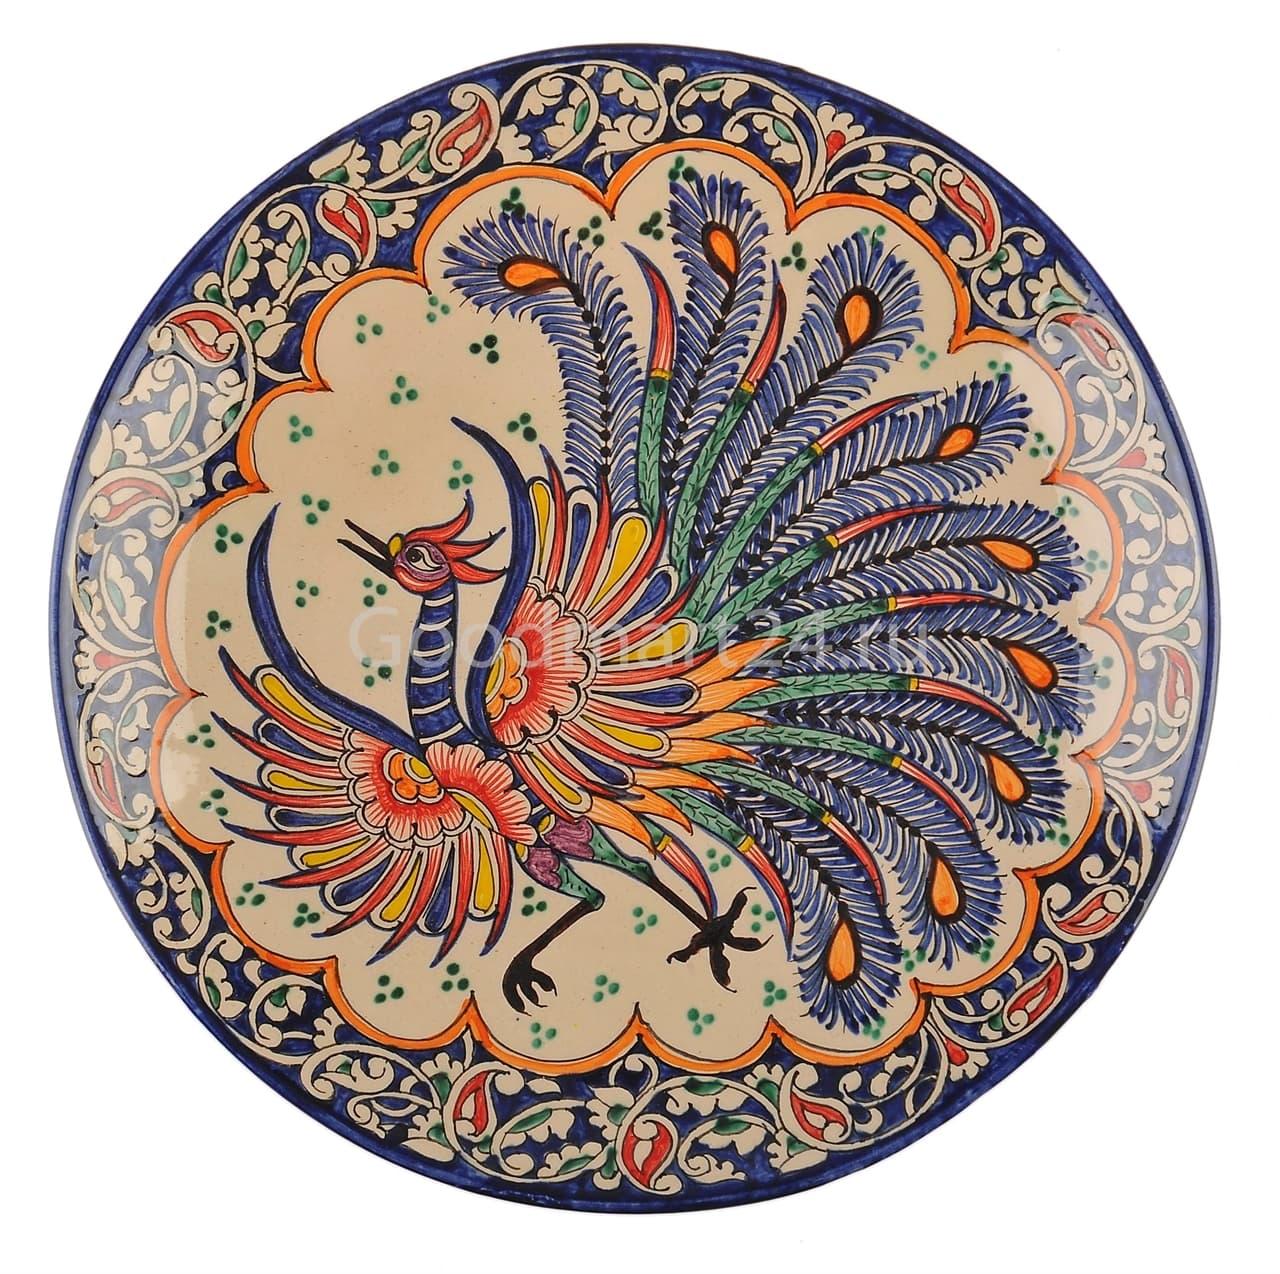 Ляган Риштанская Керамика 42 см. плоский, Жар-Птица - фото 7400